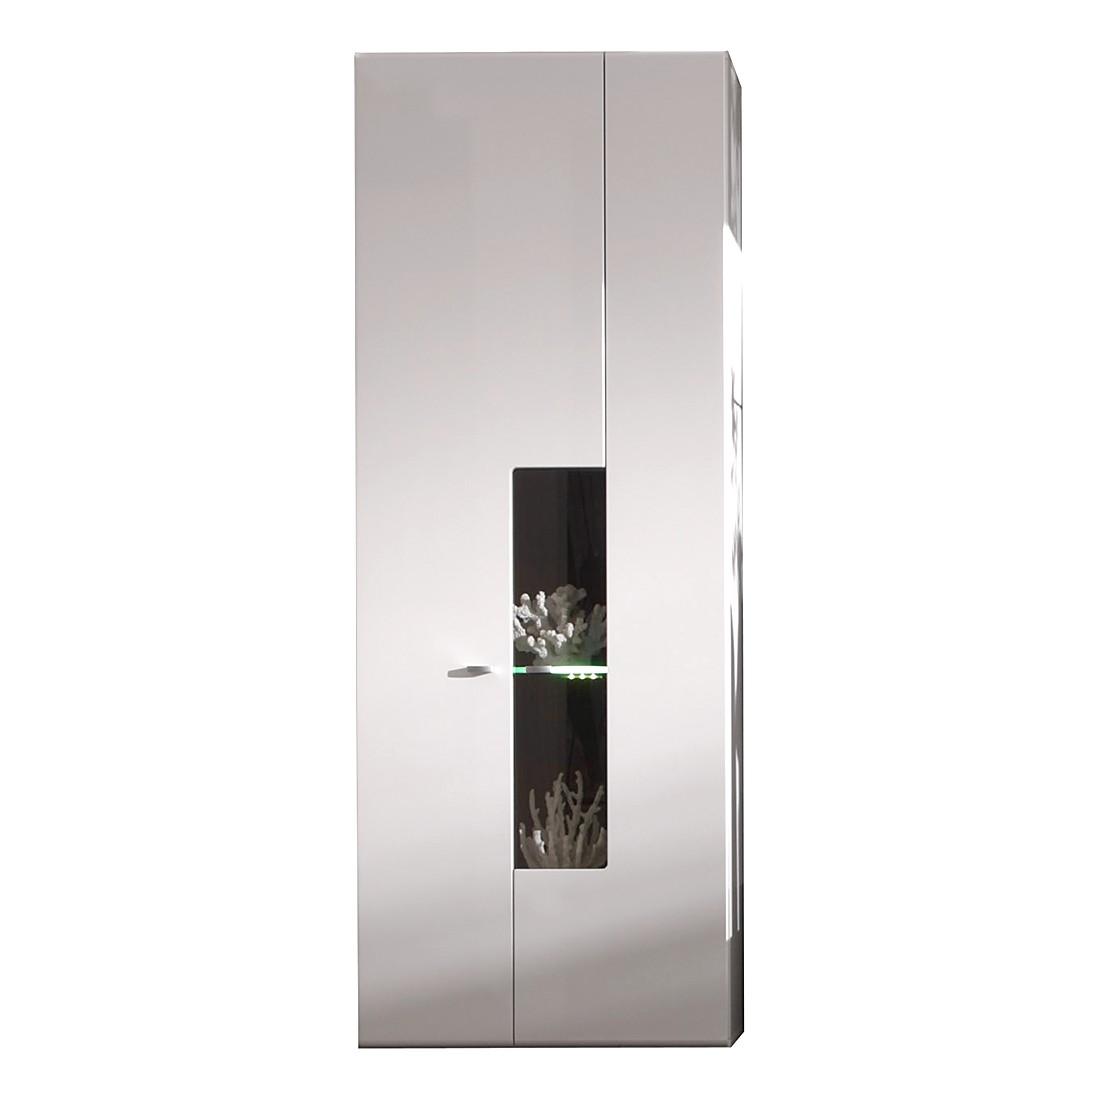 Hängevitrine Livia I (inkl. Beleuchtung) - Weiß Hochglanz (Maße: 60 x 160 x 34 cm (B/H/T))